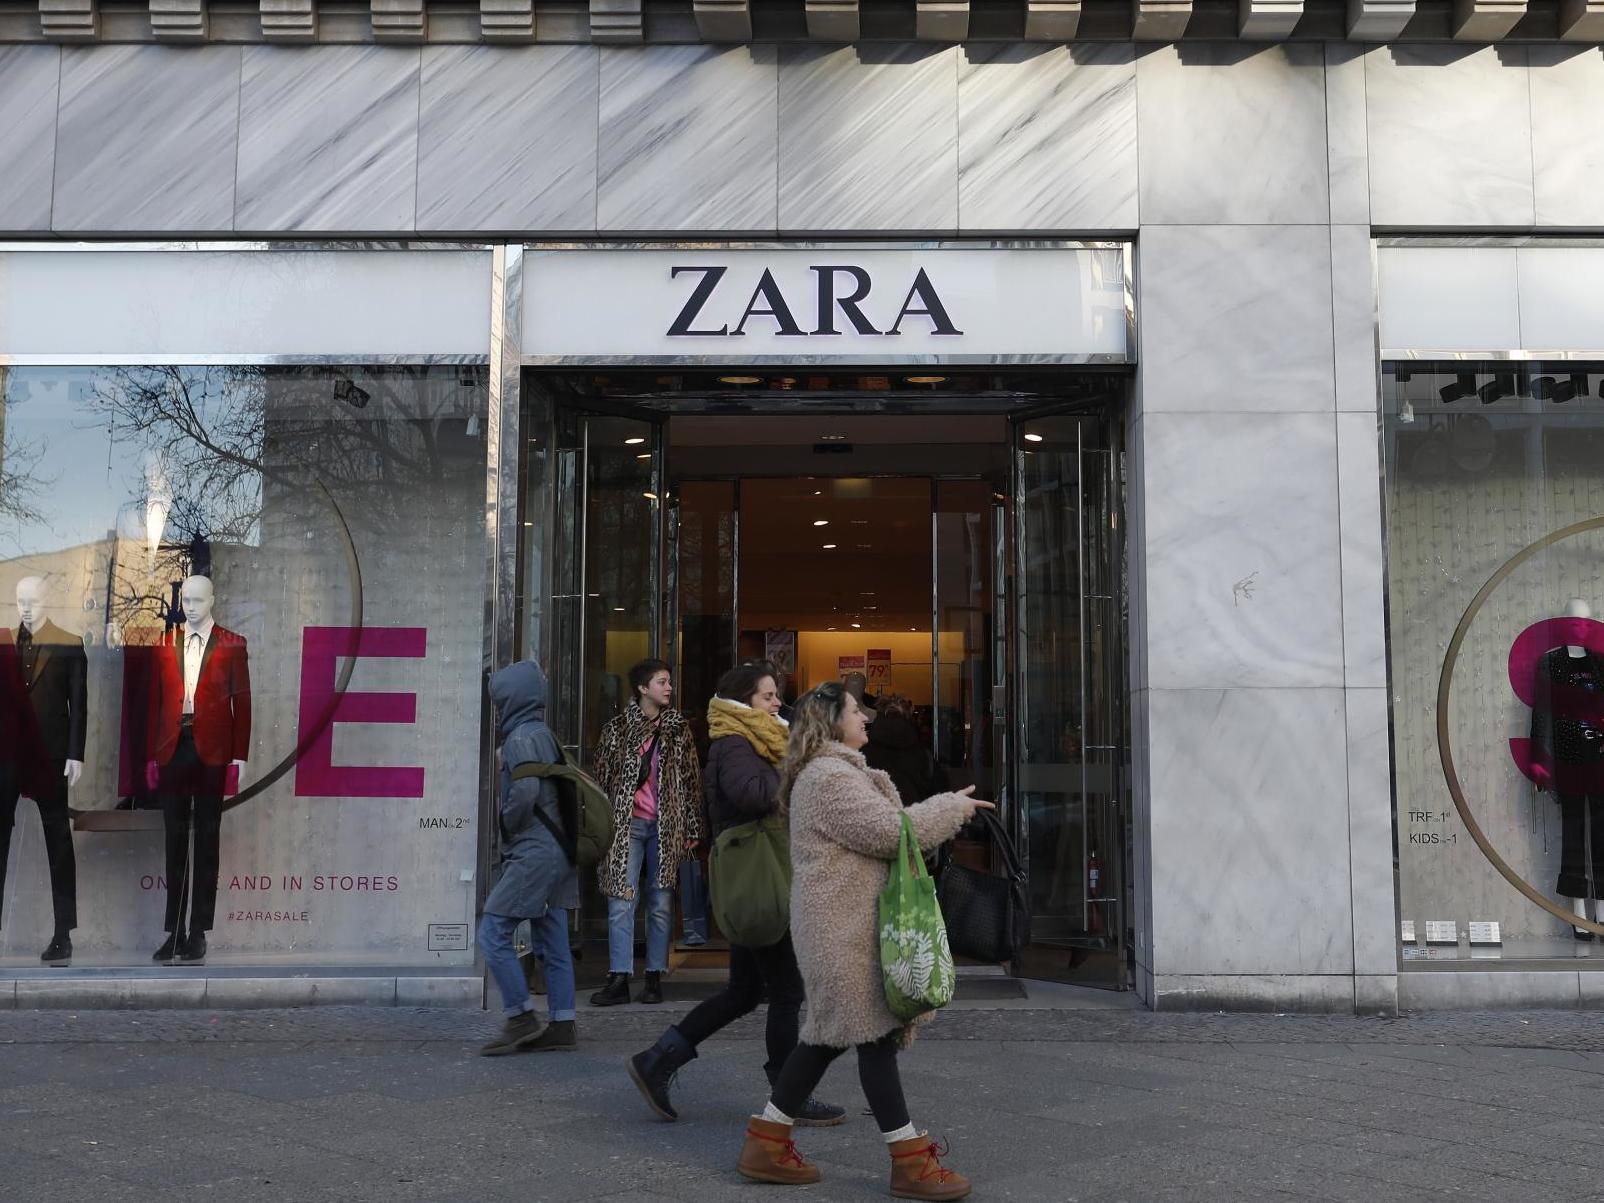 Zara owner Inditex to close up to 1,200 fashion stores around the world